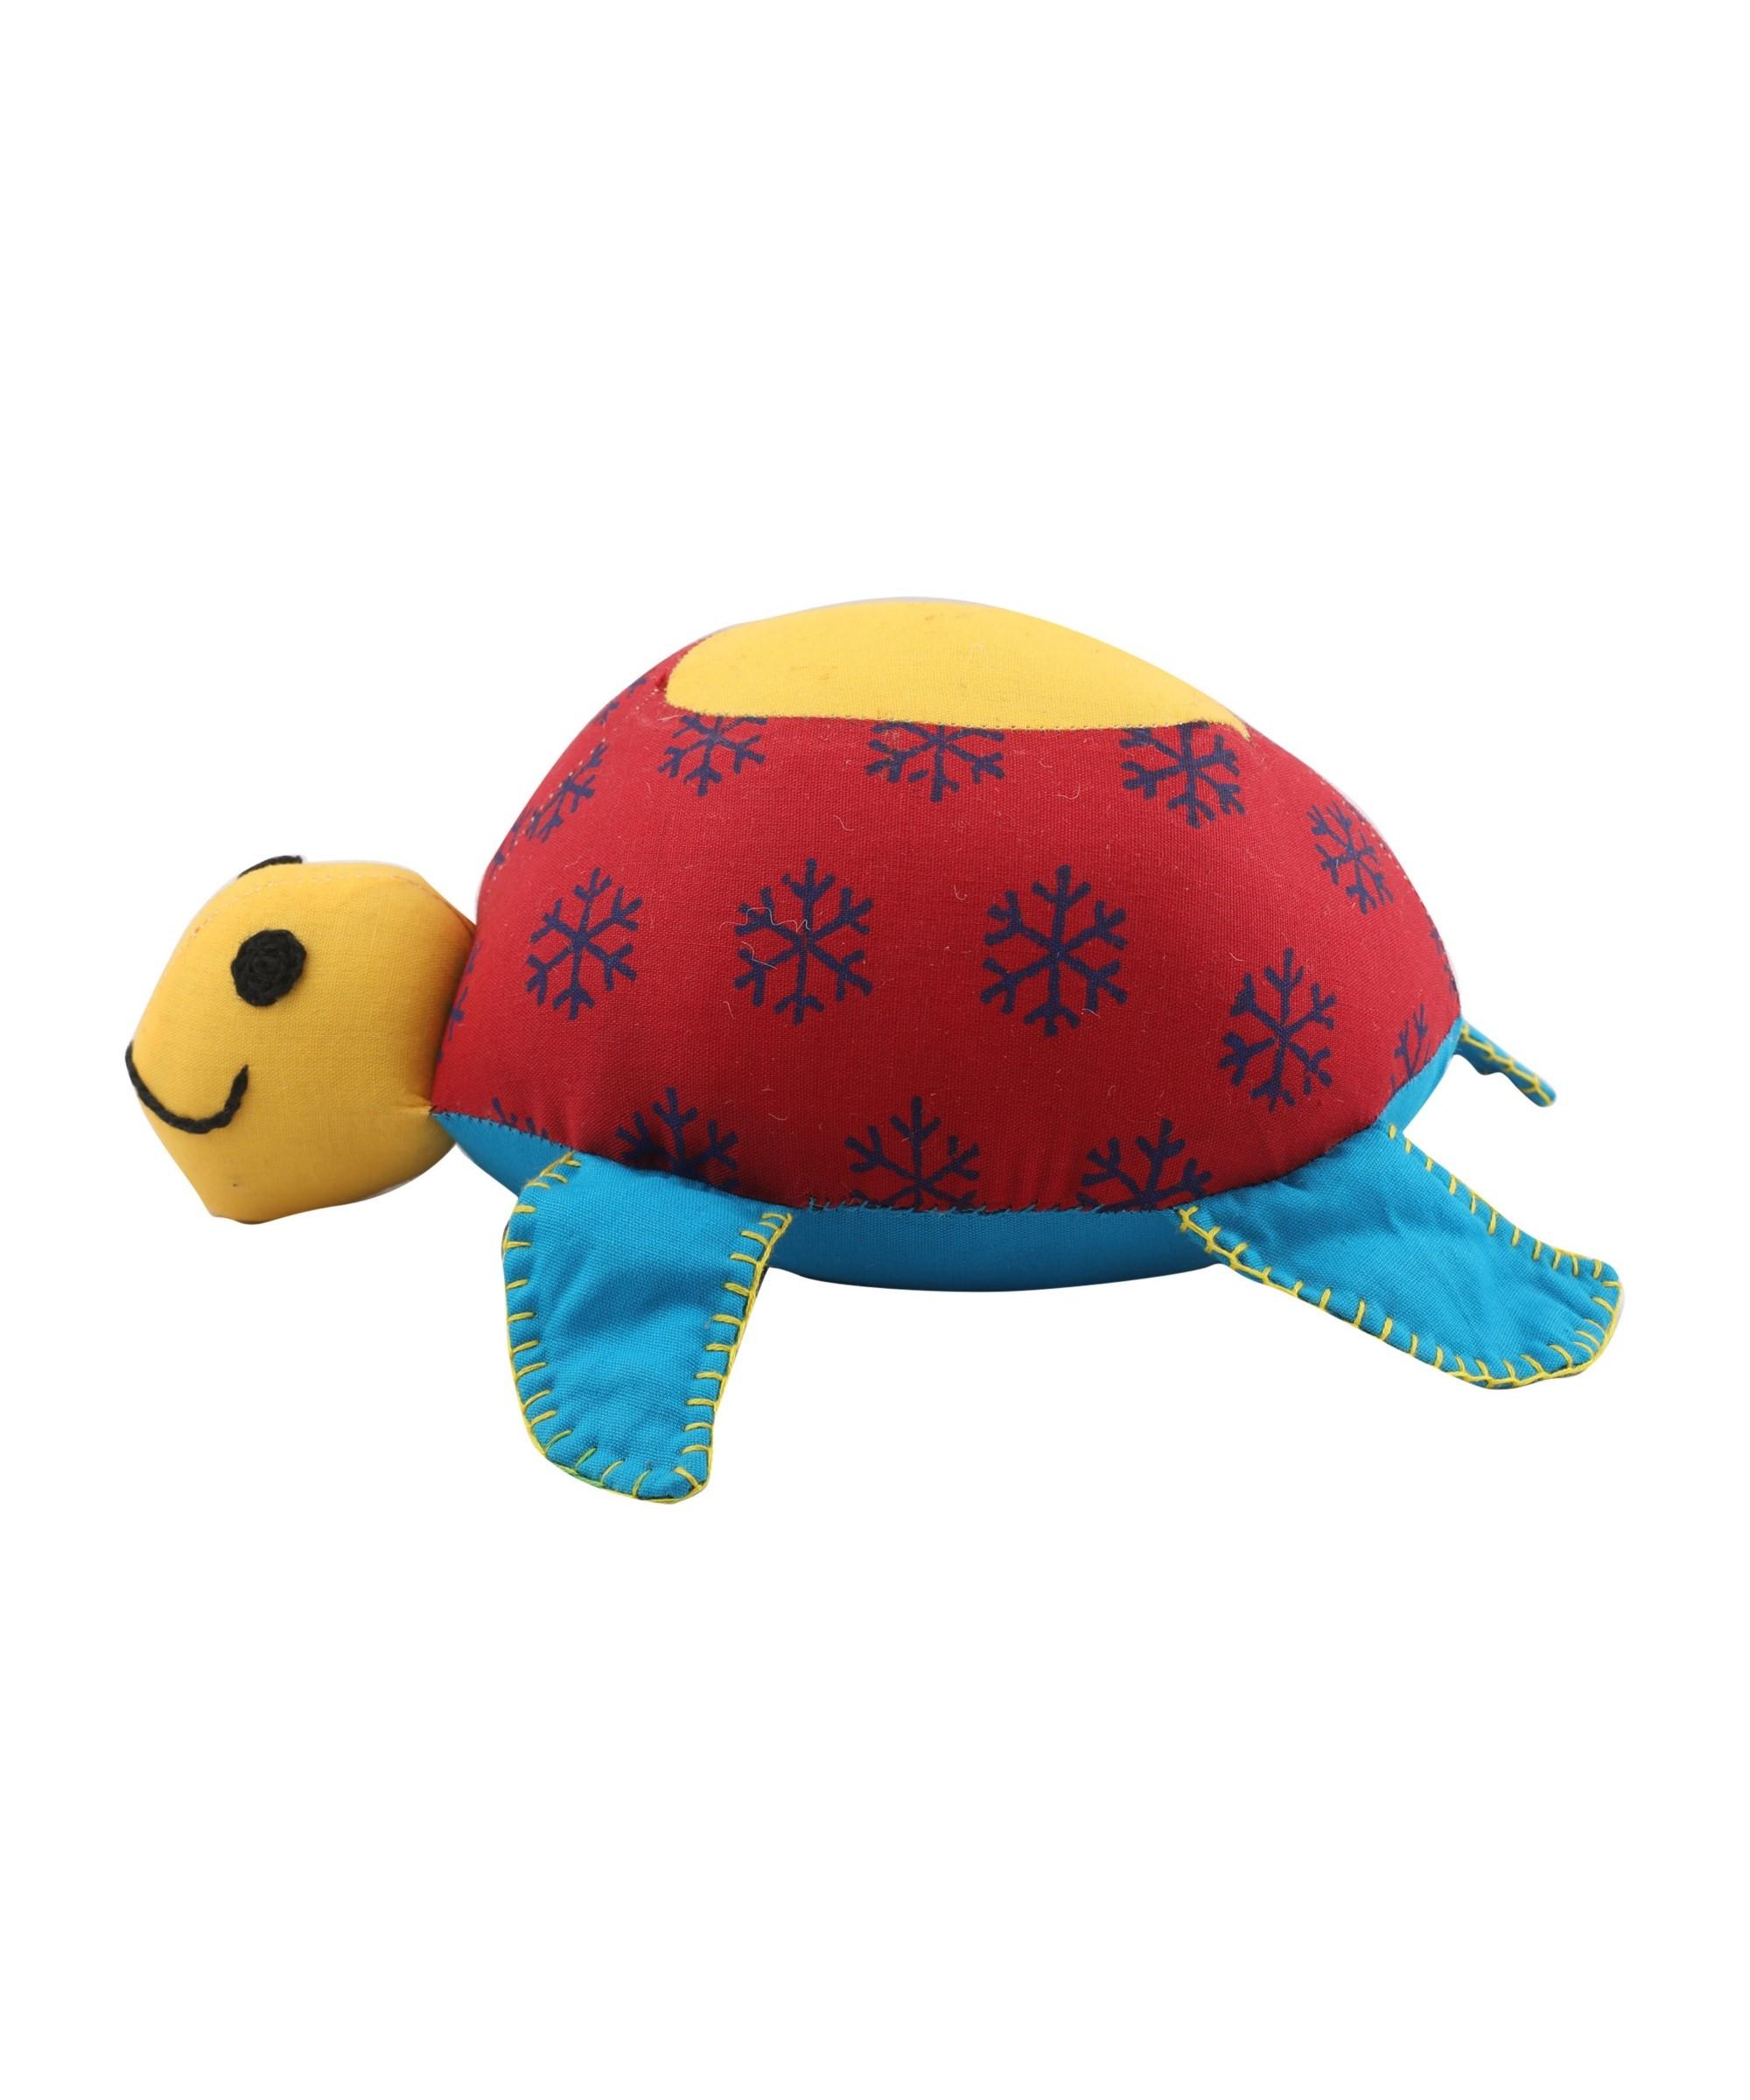 Patchwork Block Printed Soft Toy Tortoise - Big (Multicoloured) Slider Thumbnail 1/3